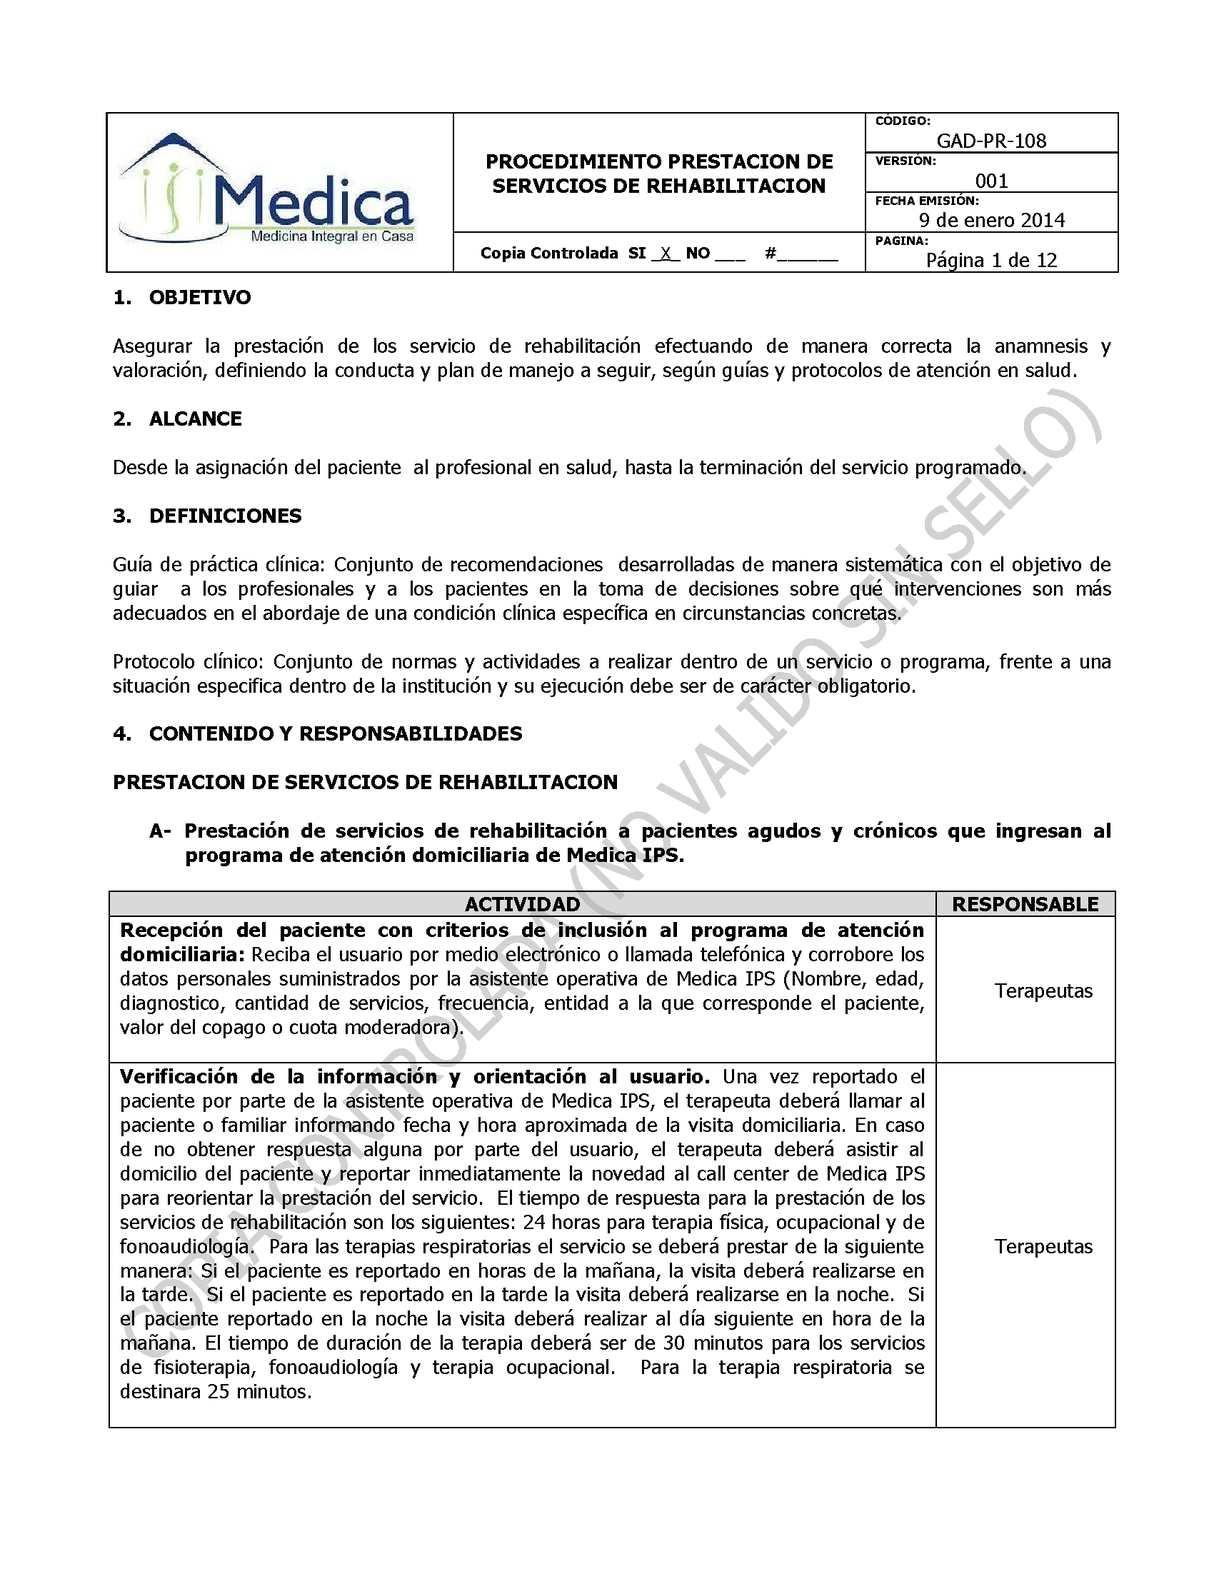 Calaméo - GAD-PR-108 PROC - REHABILITACION